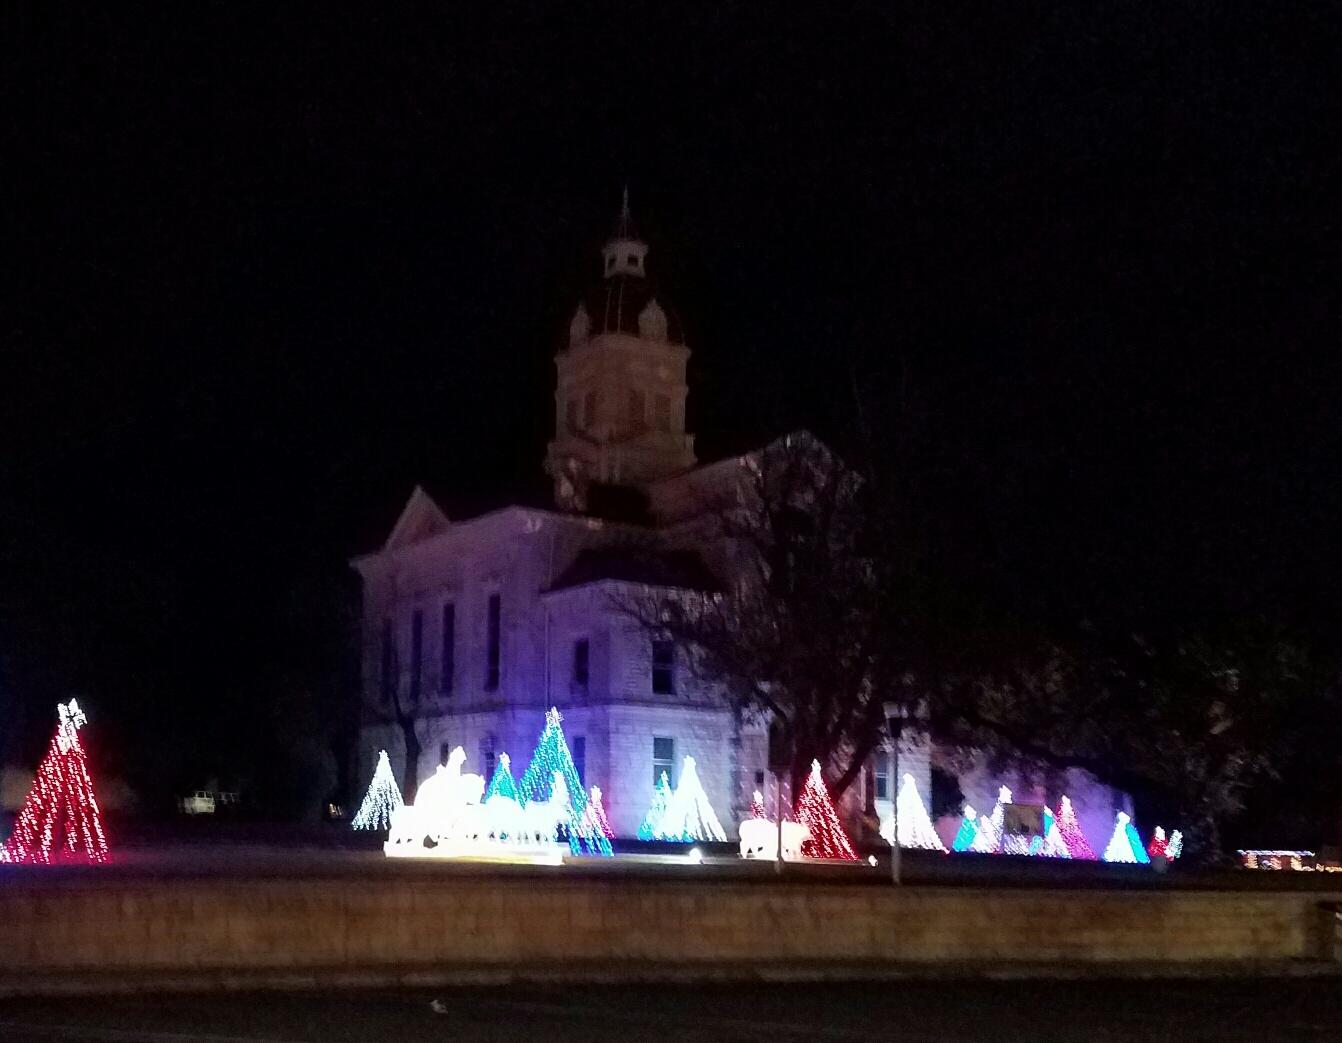 Bandera-County-Courthouse.jpg